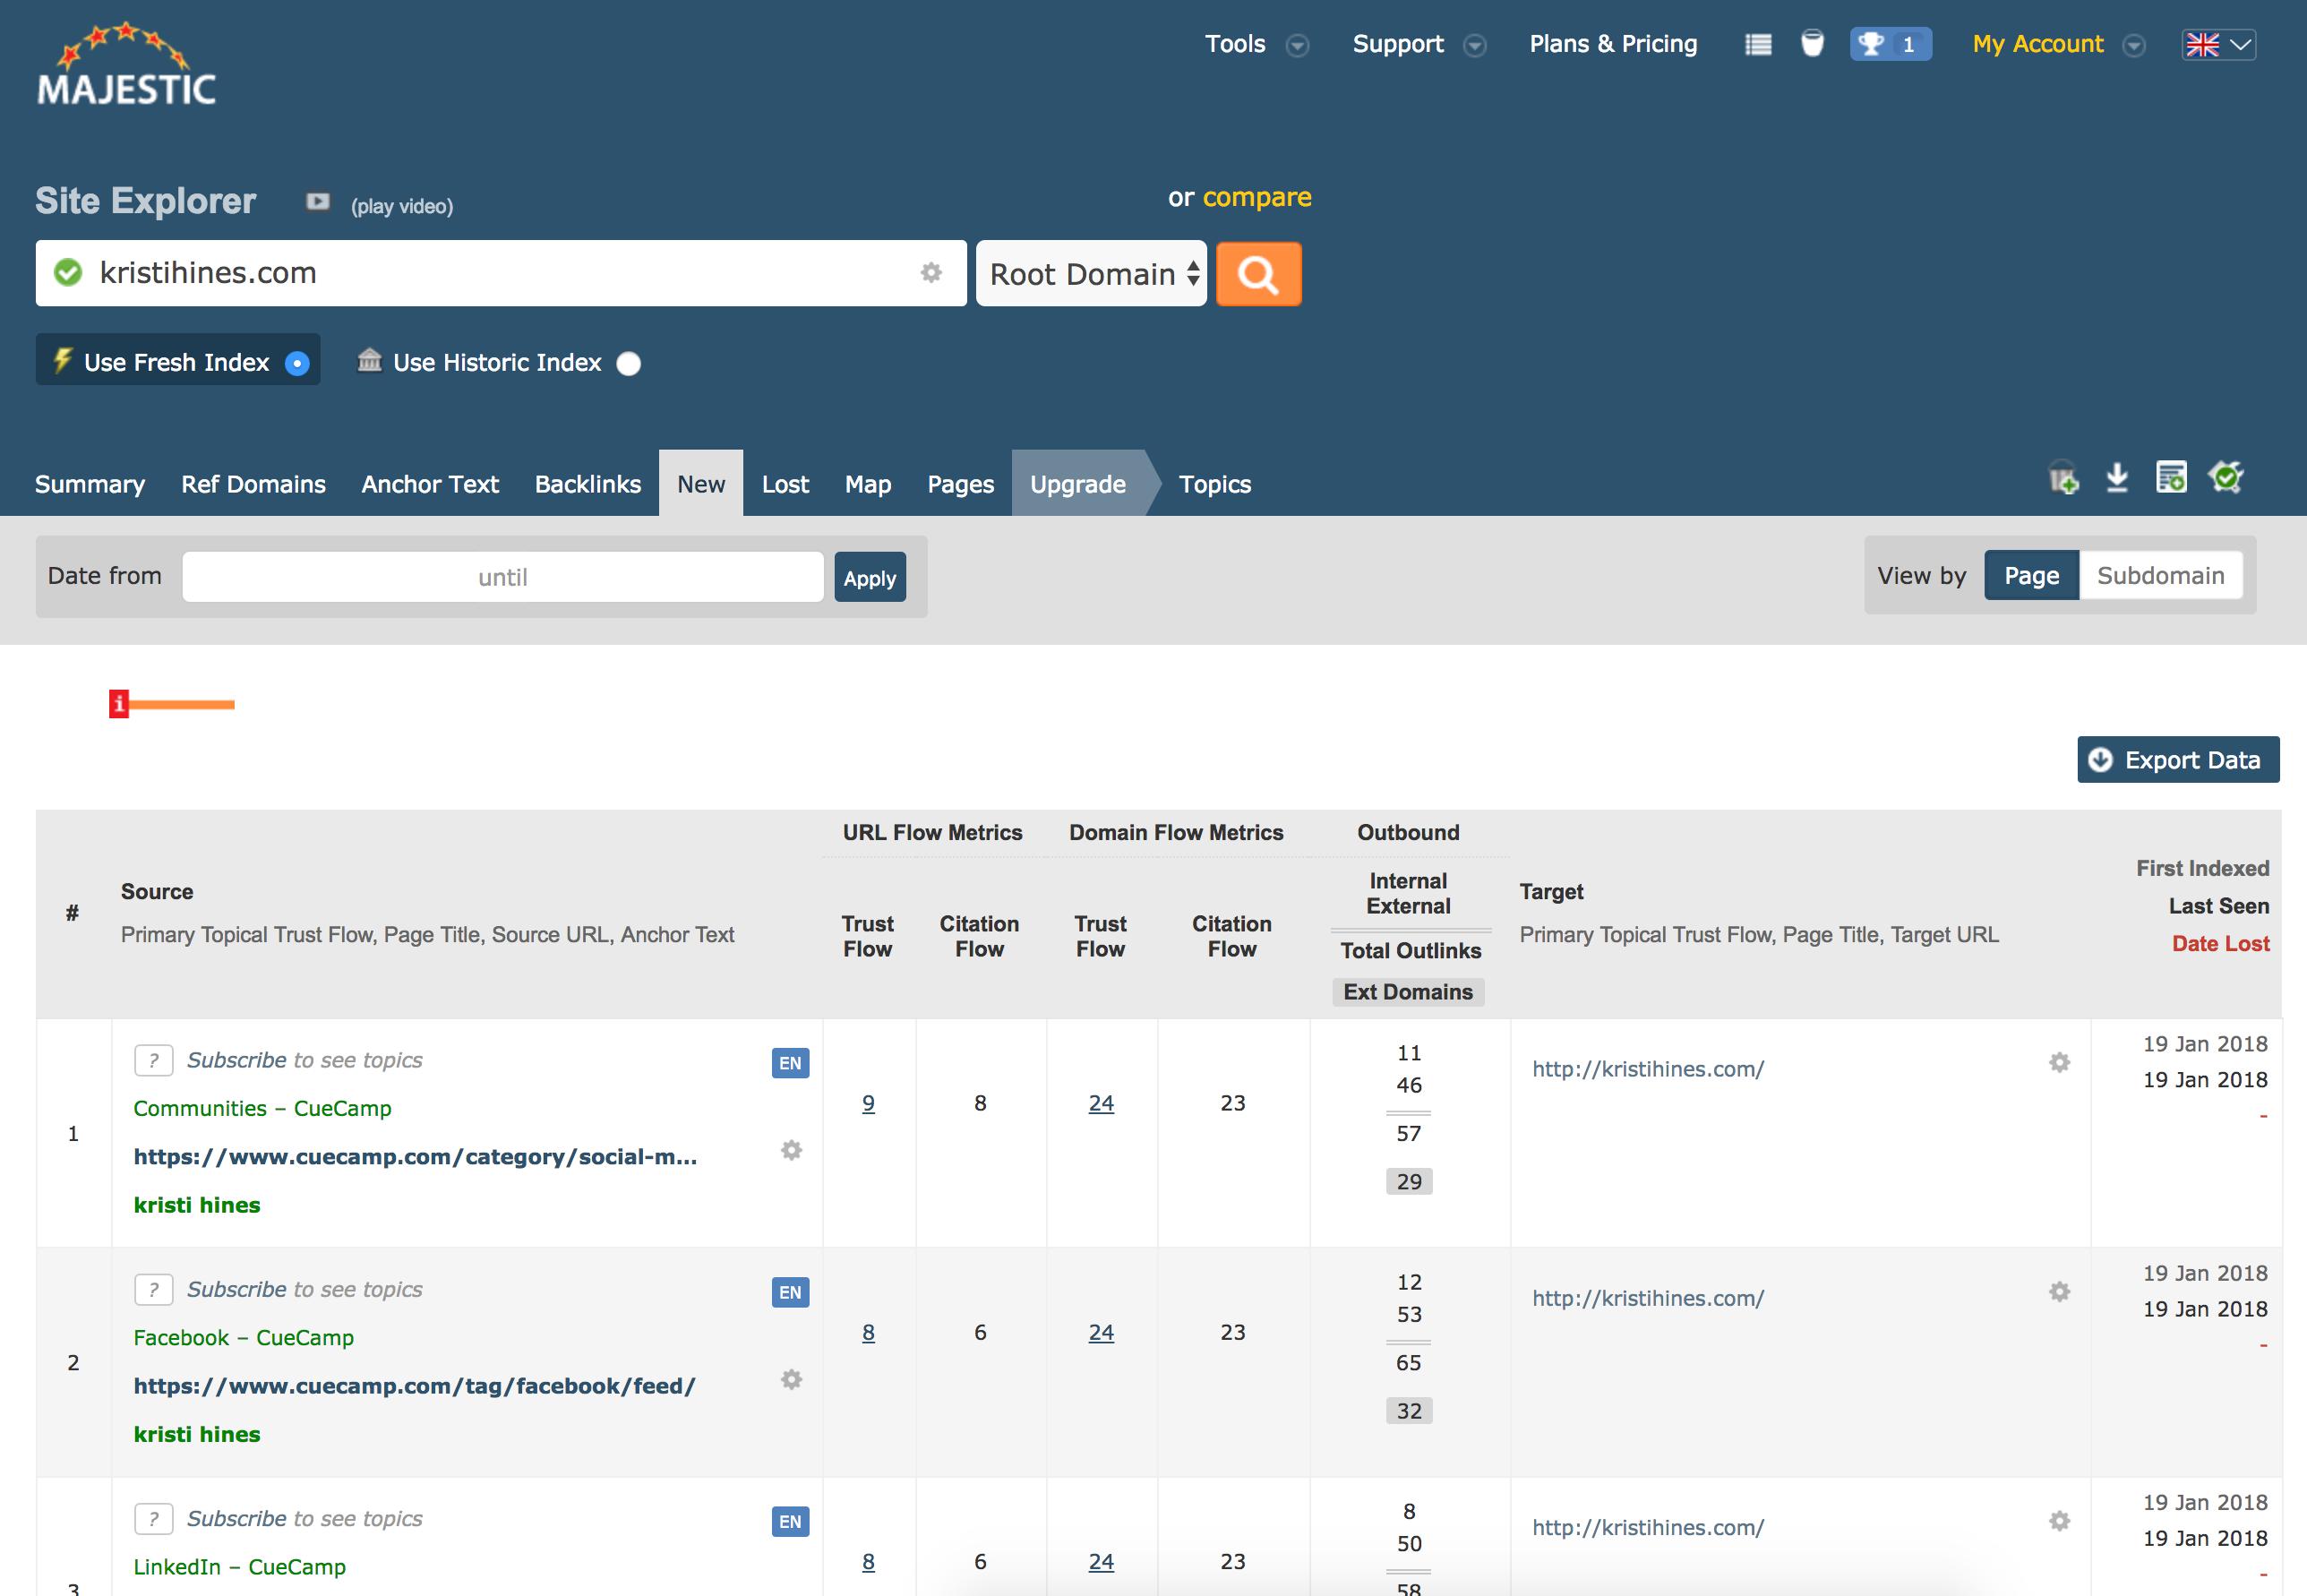 SEO Tools Software Comparison - MajesticSEO